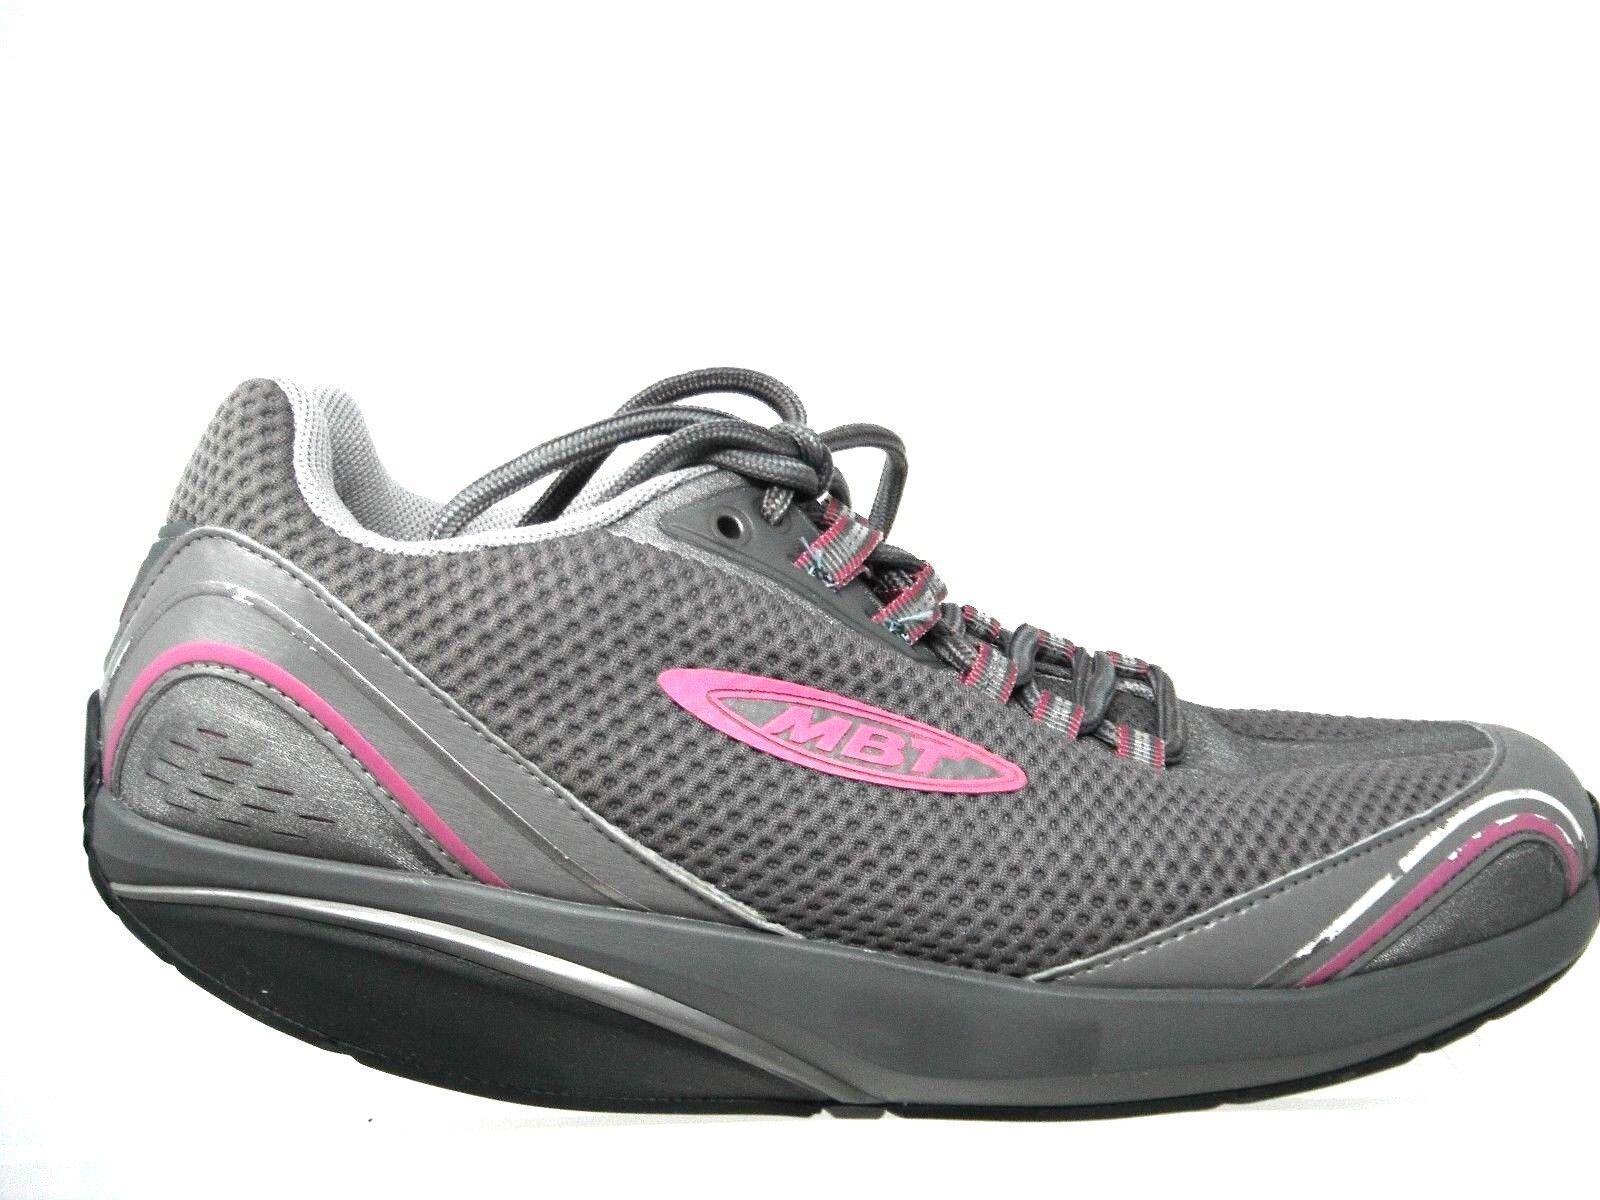 MBT Mahuta Gull 400284-133 Pink Grey Orthopedic Sneaker Womens Size 40 9-9.5